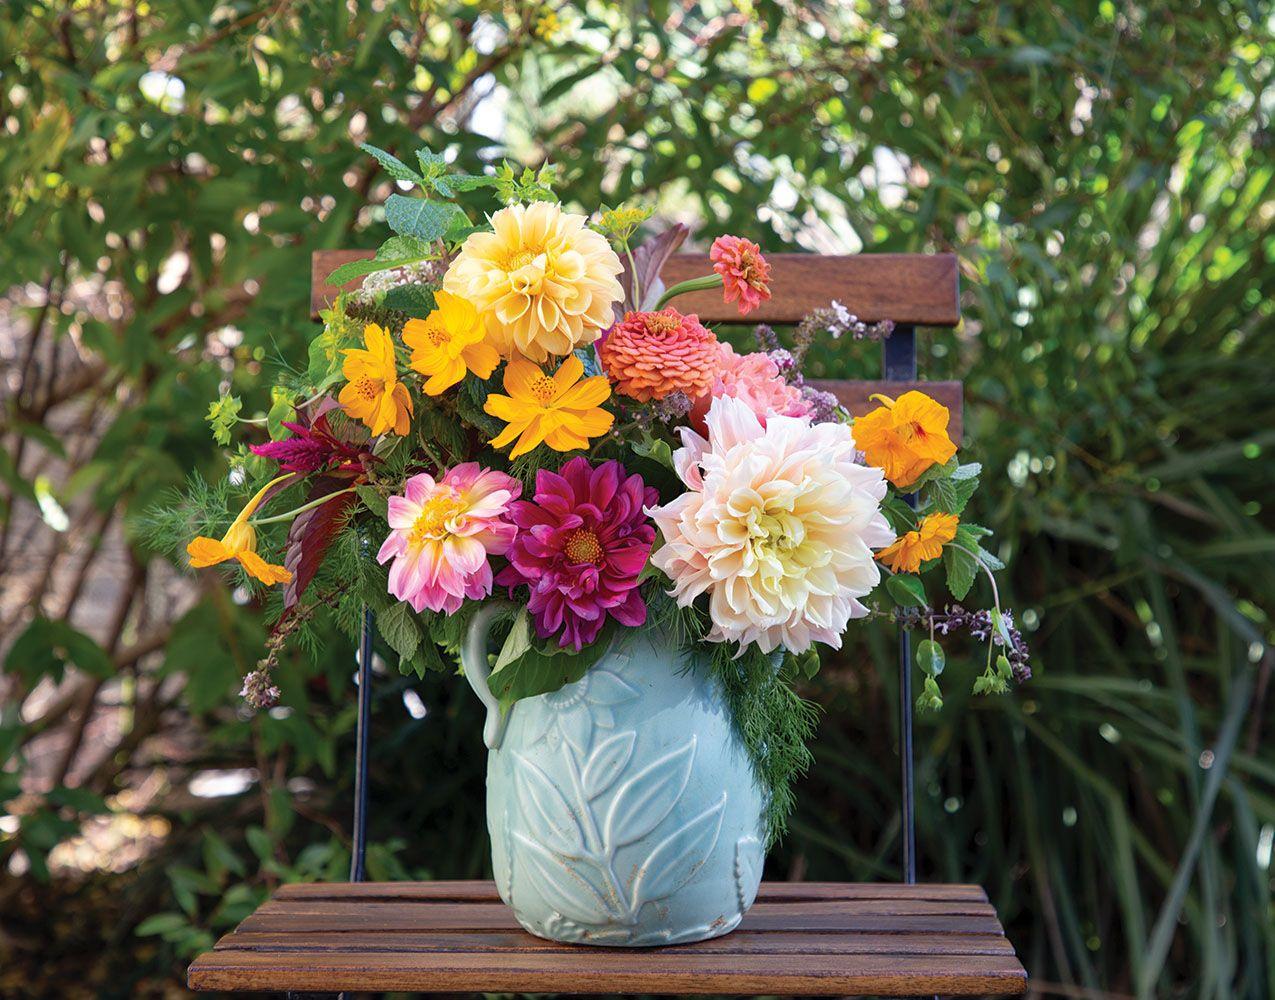 Our Favorite Dahlia Arrangements In 2020 Dahlia Flower Arrangements Flower Arrangements Dahlia Flower